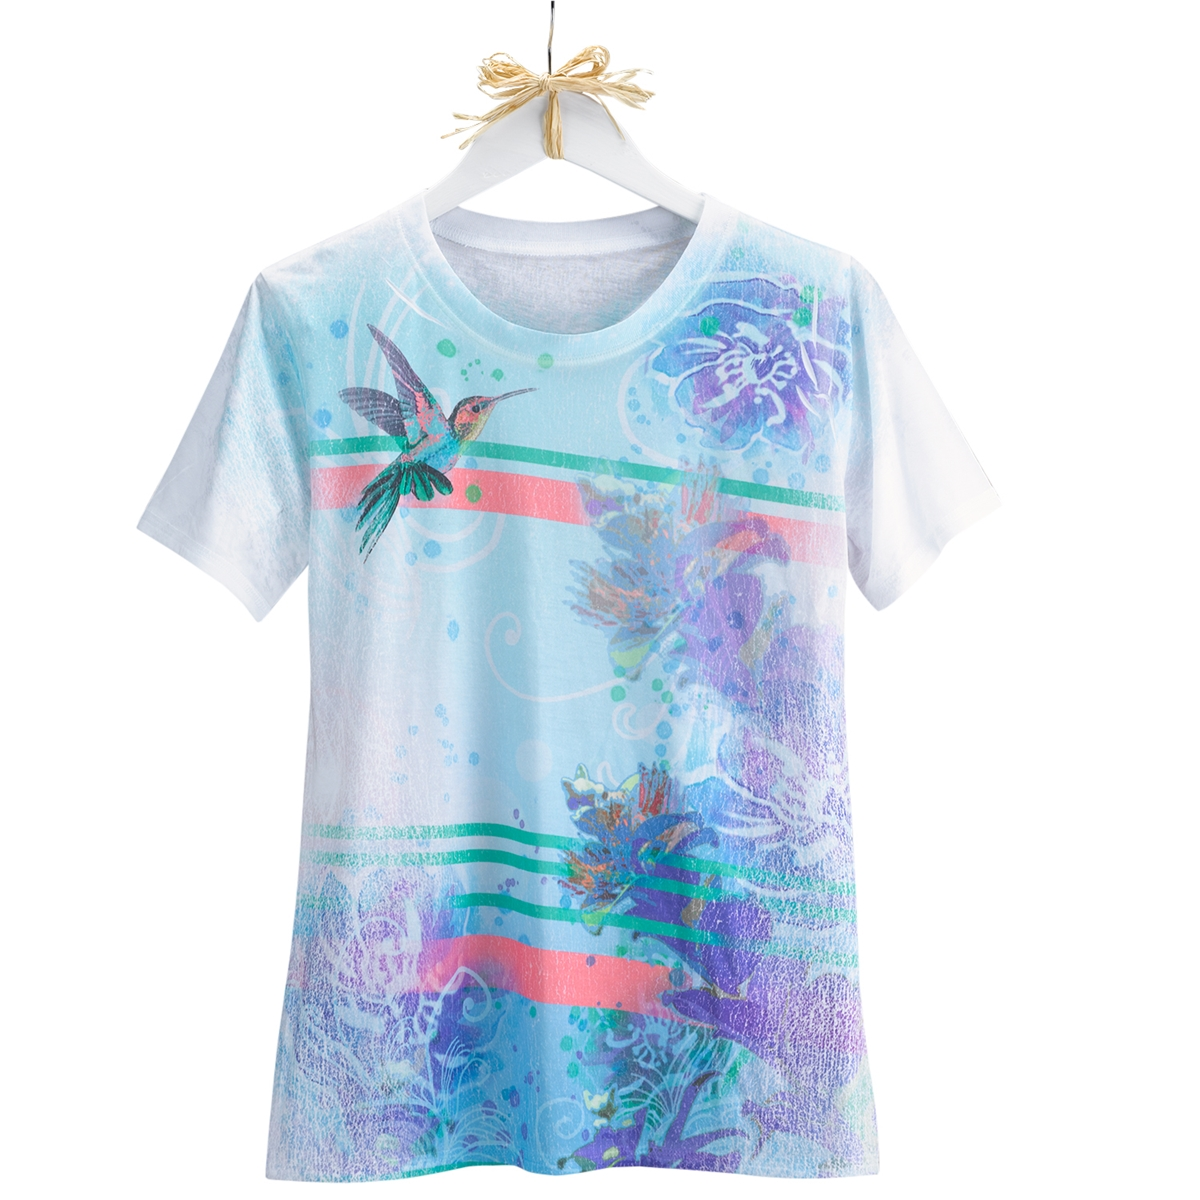 Hummingbird Linear Design Tee